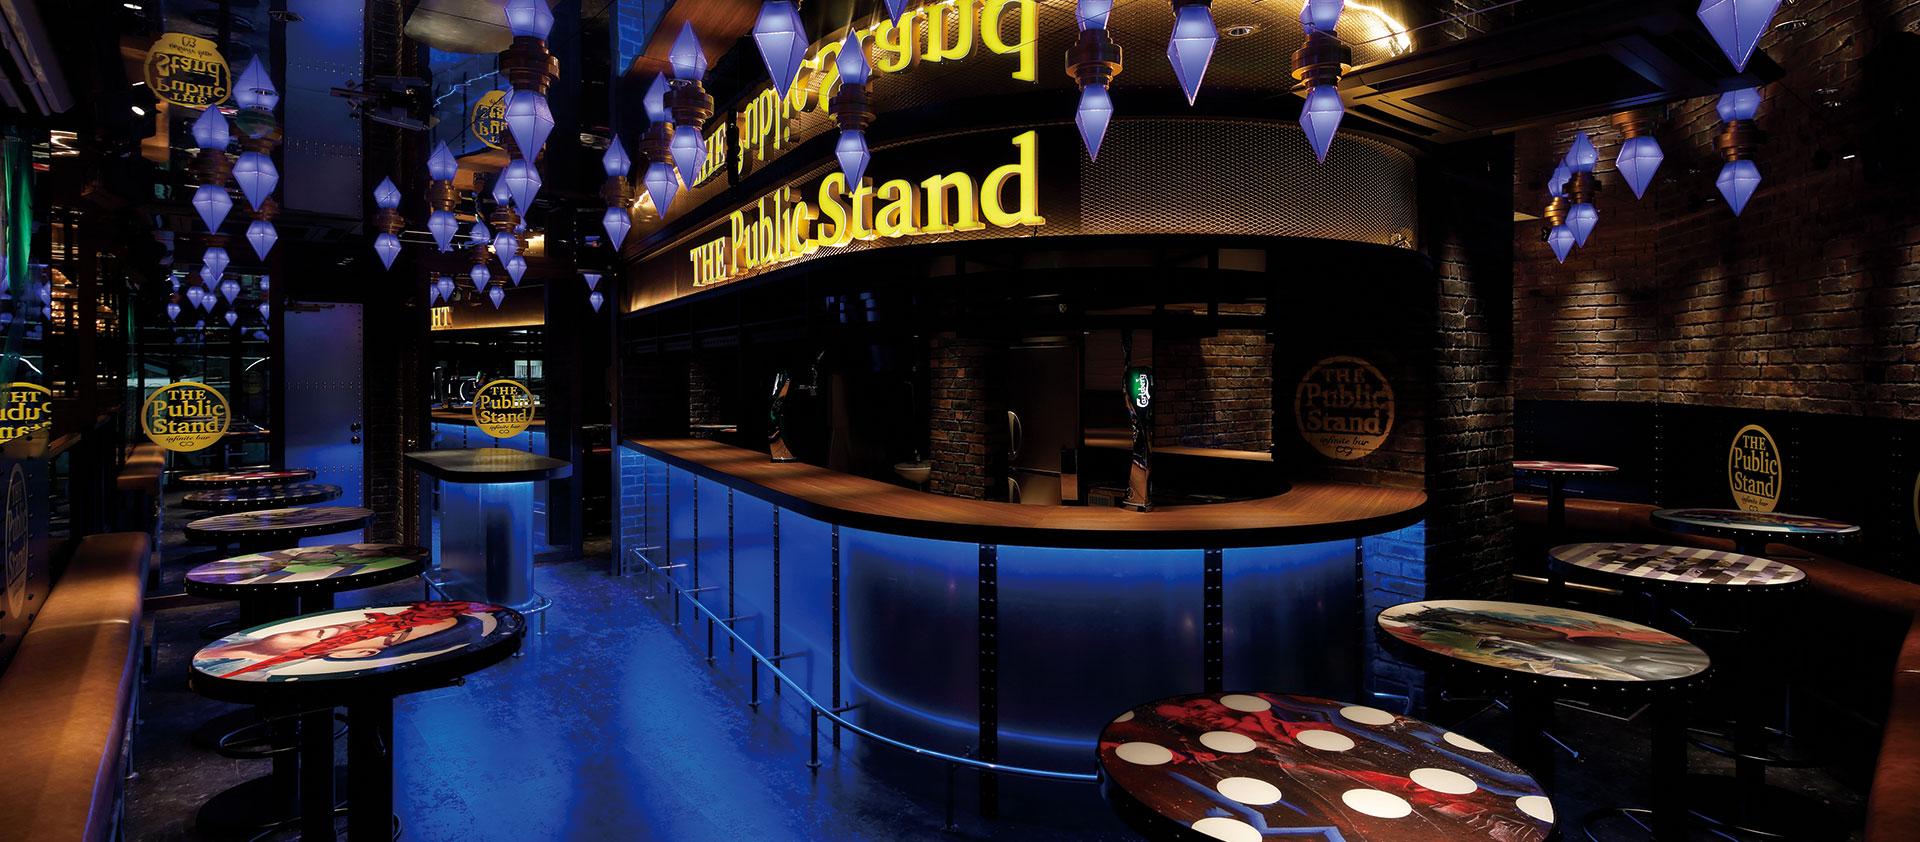 Public stand 船橋店